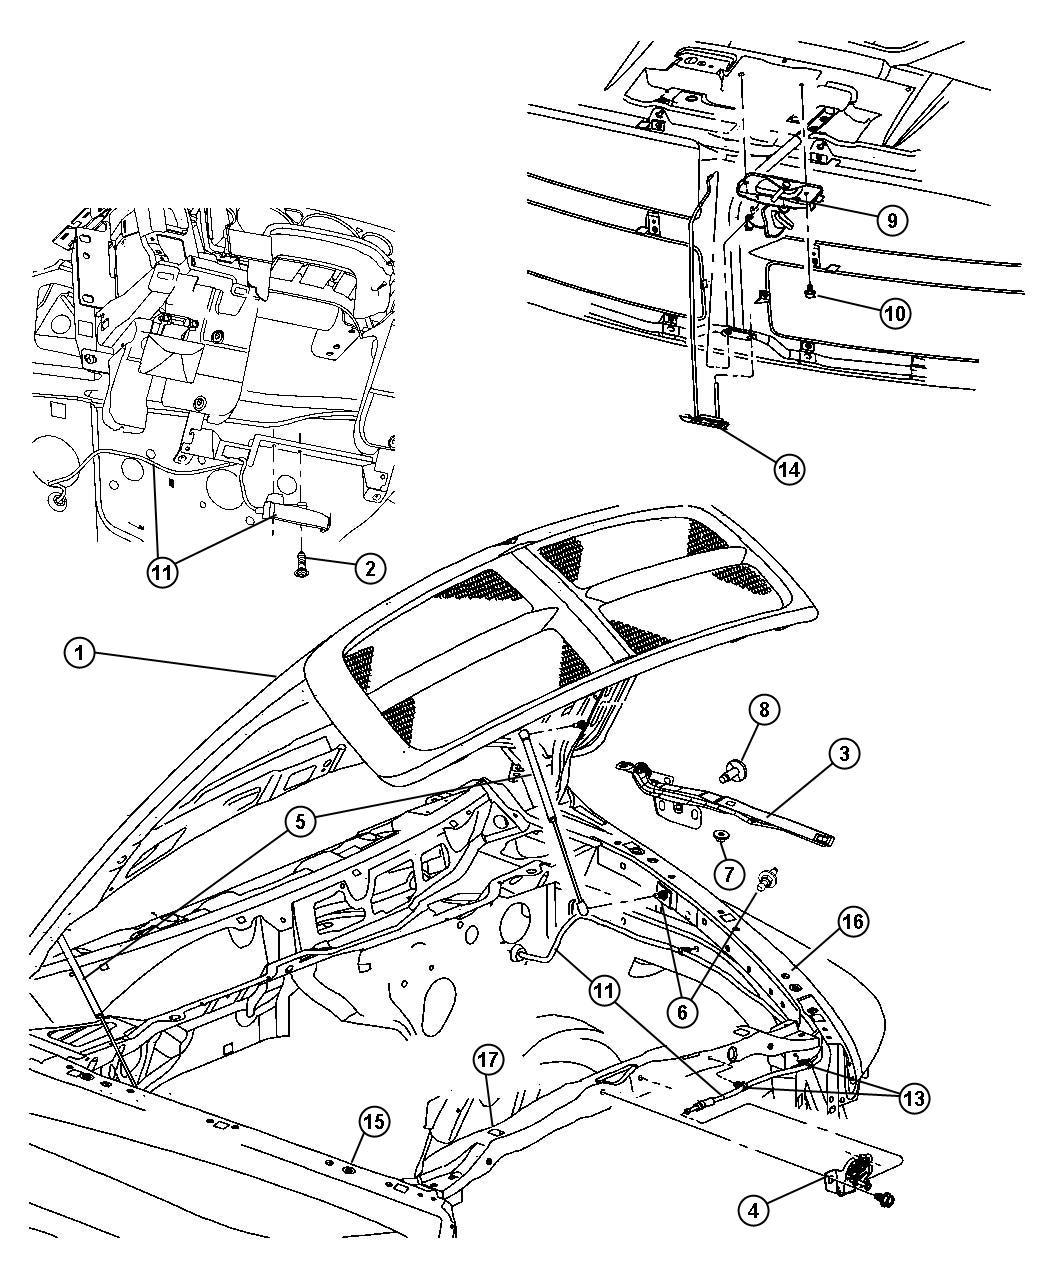 Dodge Ram Slt Quad Cab 5 7l Hemi V8 A T 4x4 Rod